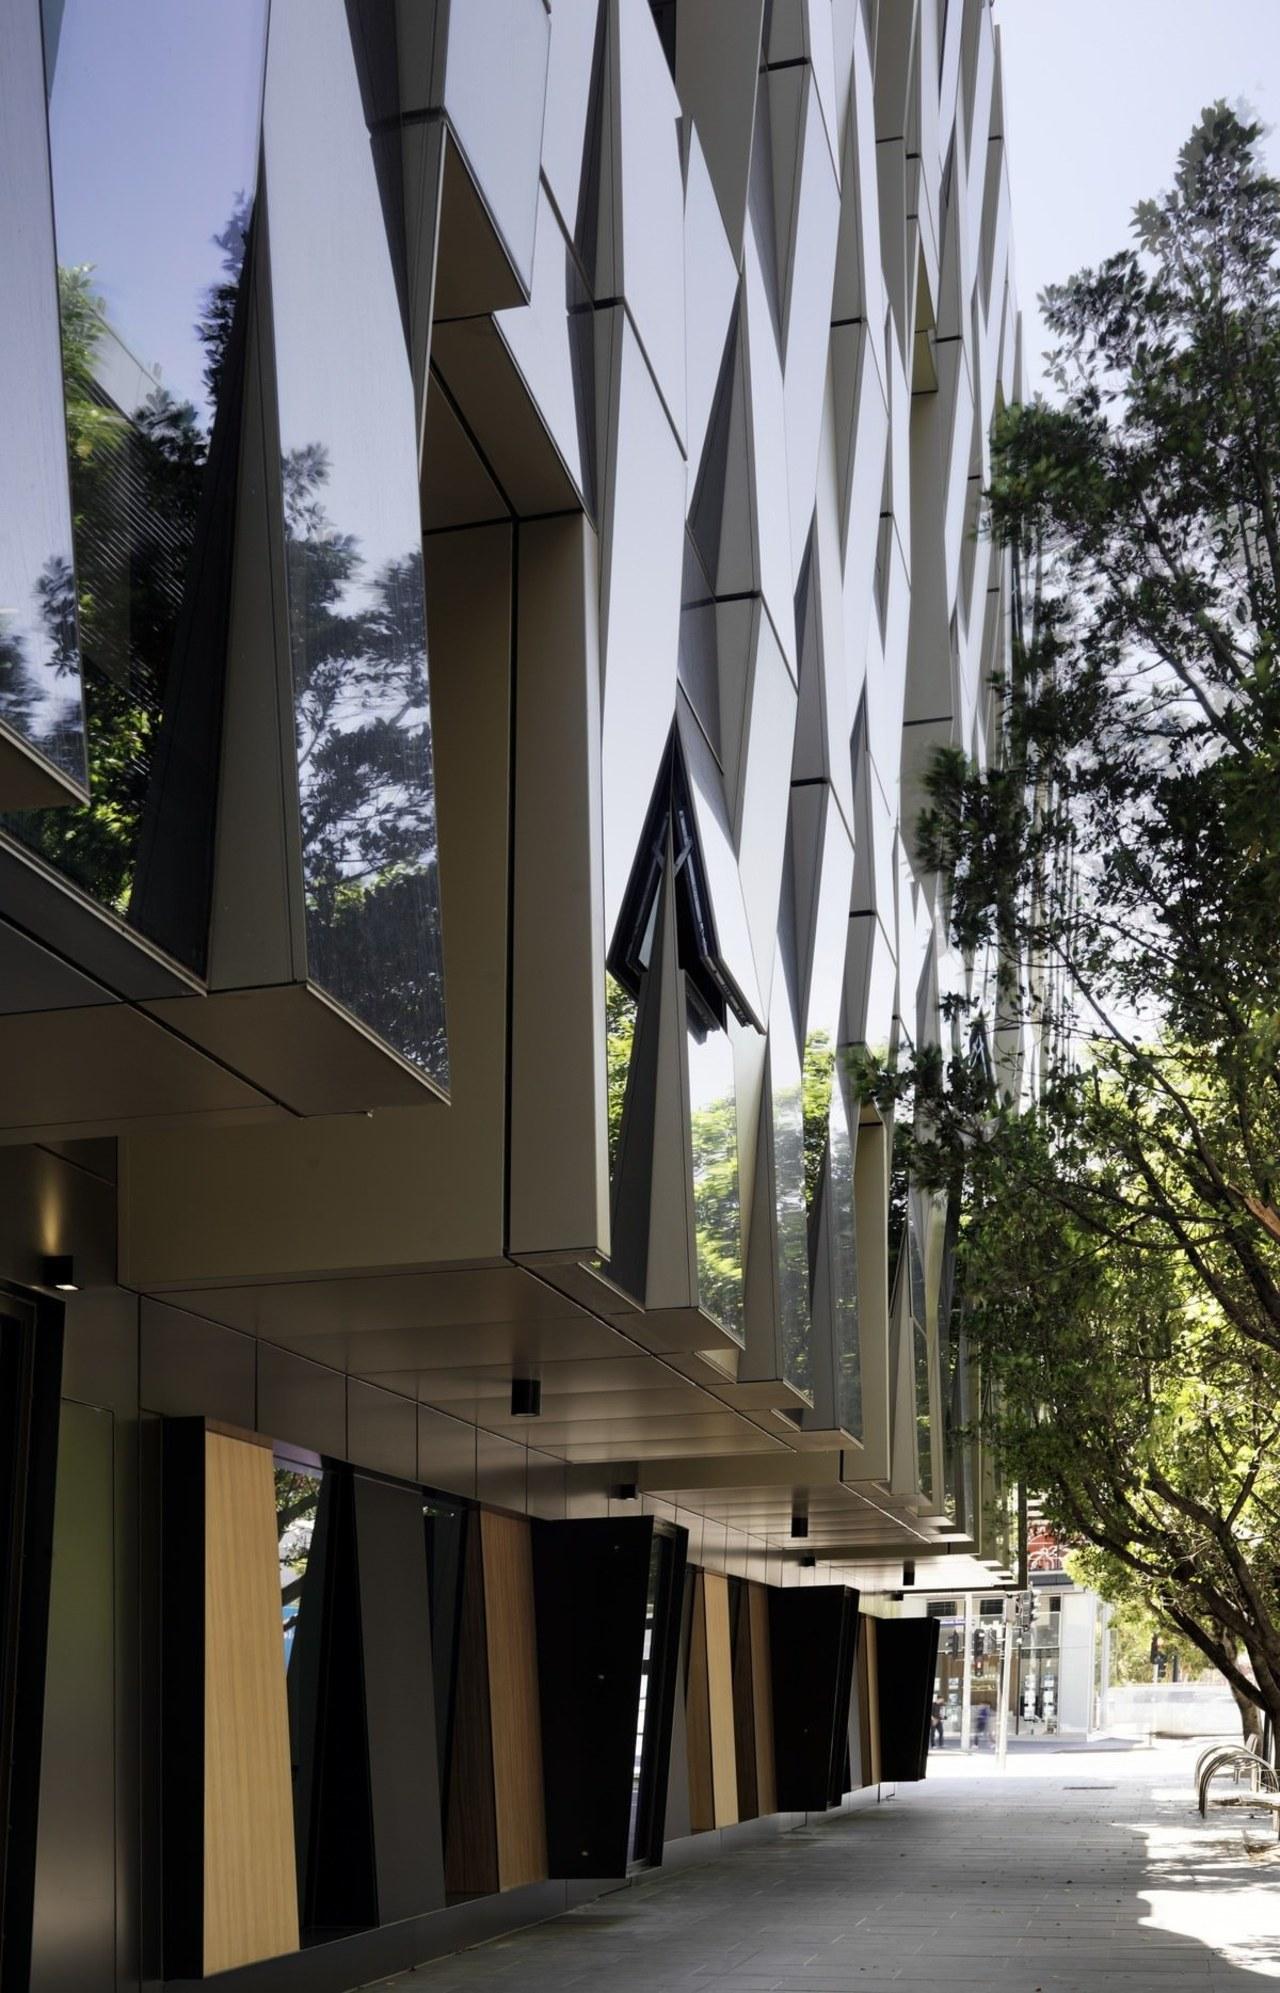 Promenade Aqui by Woods Bagot architecture, building, facade, house, black, gray